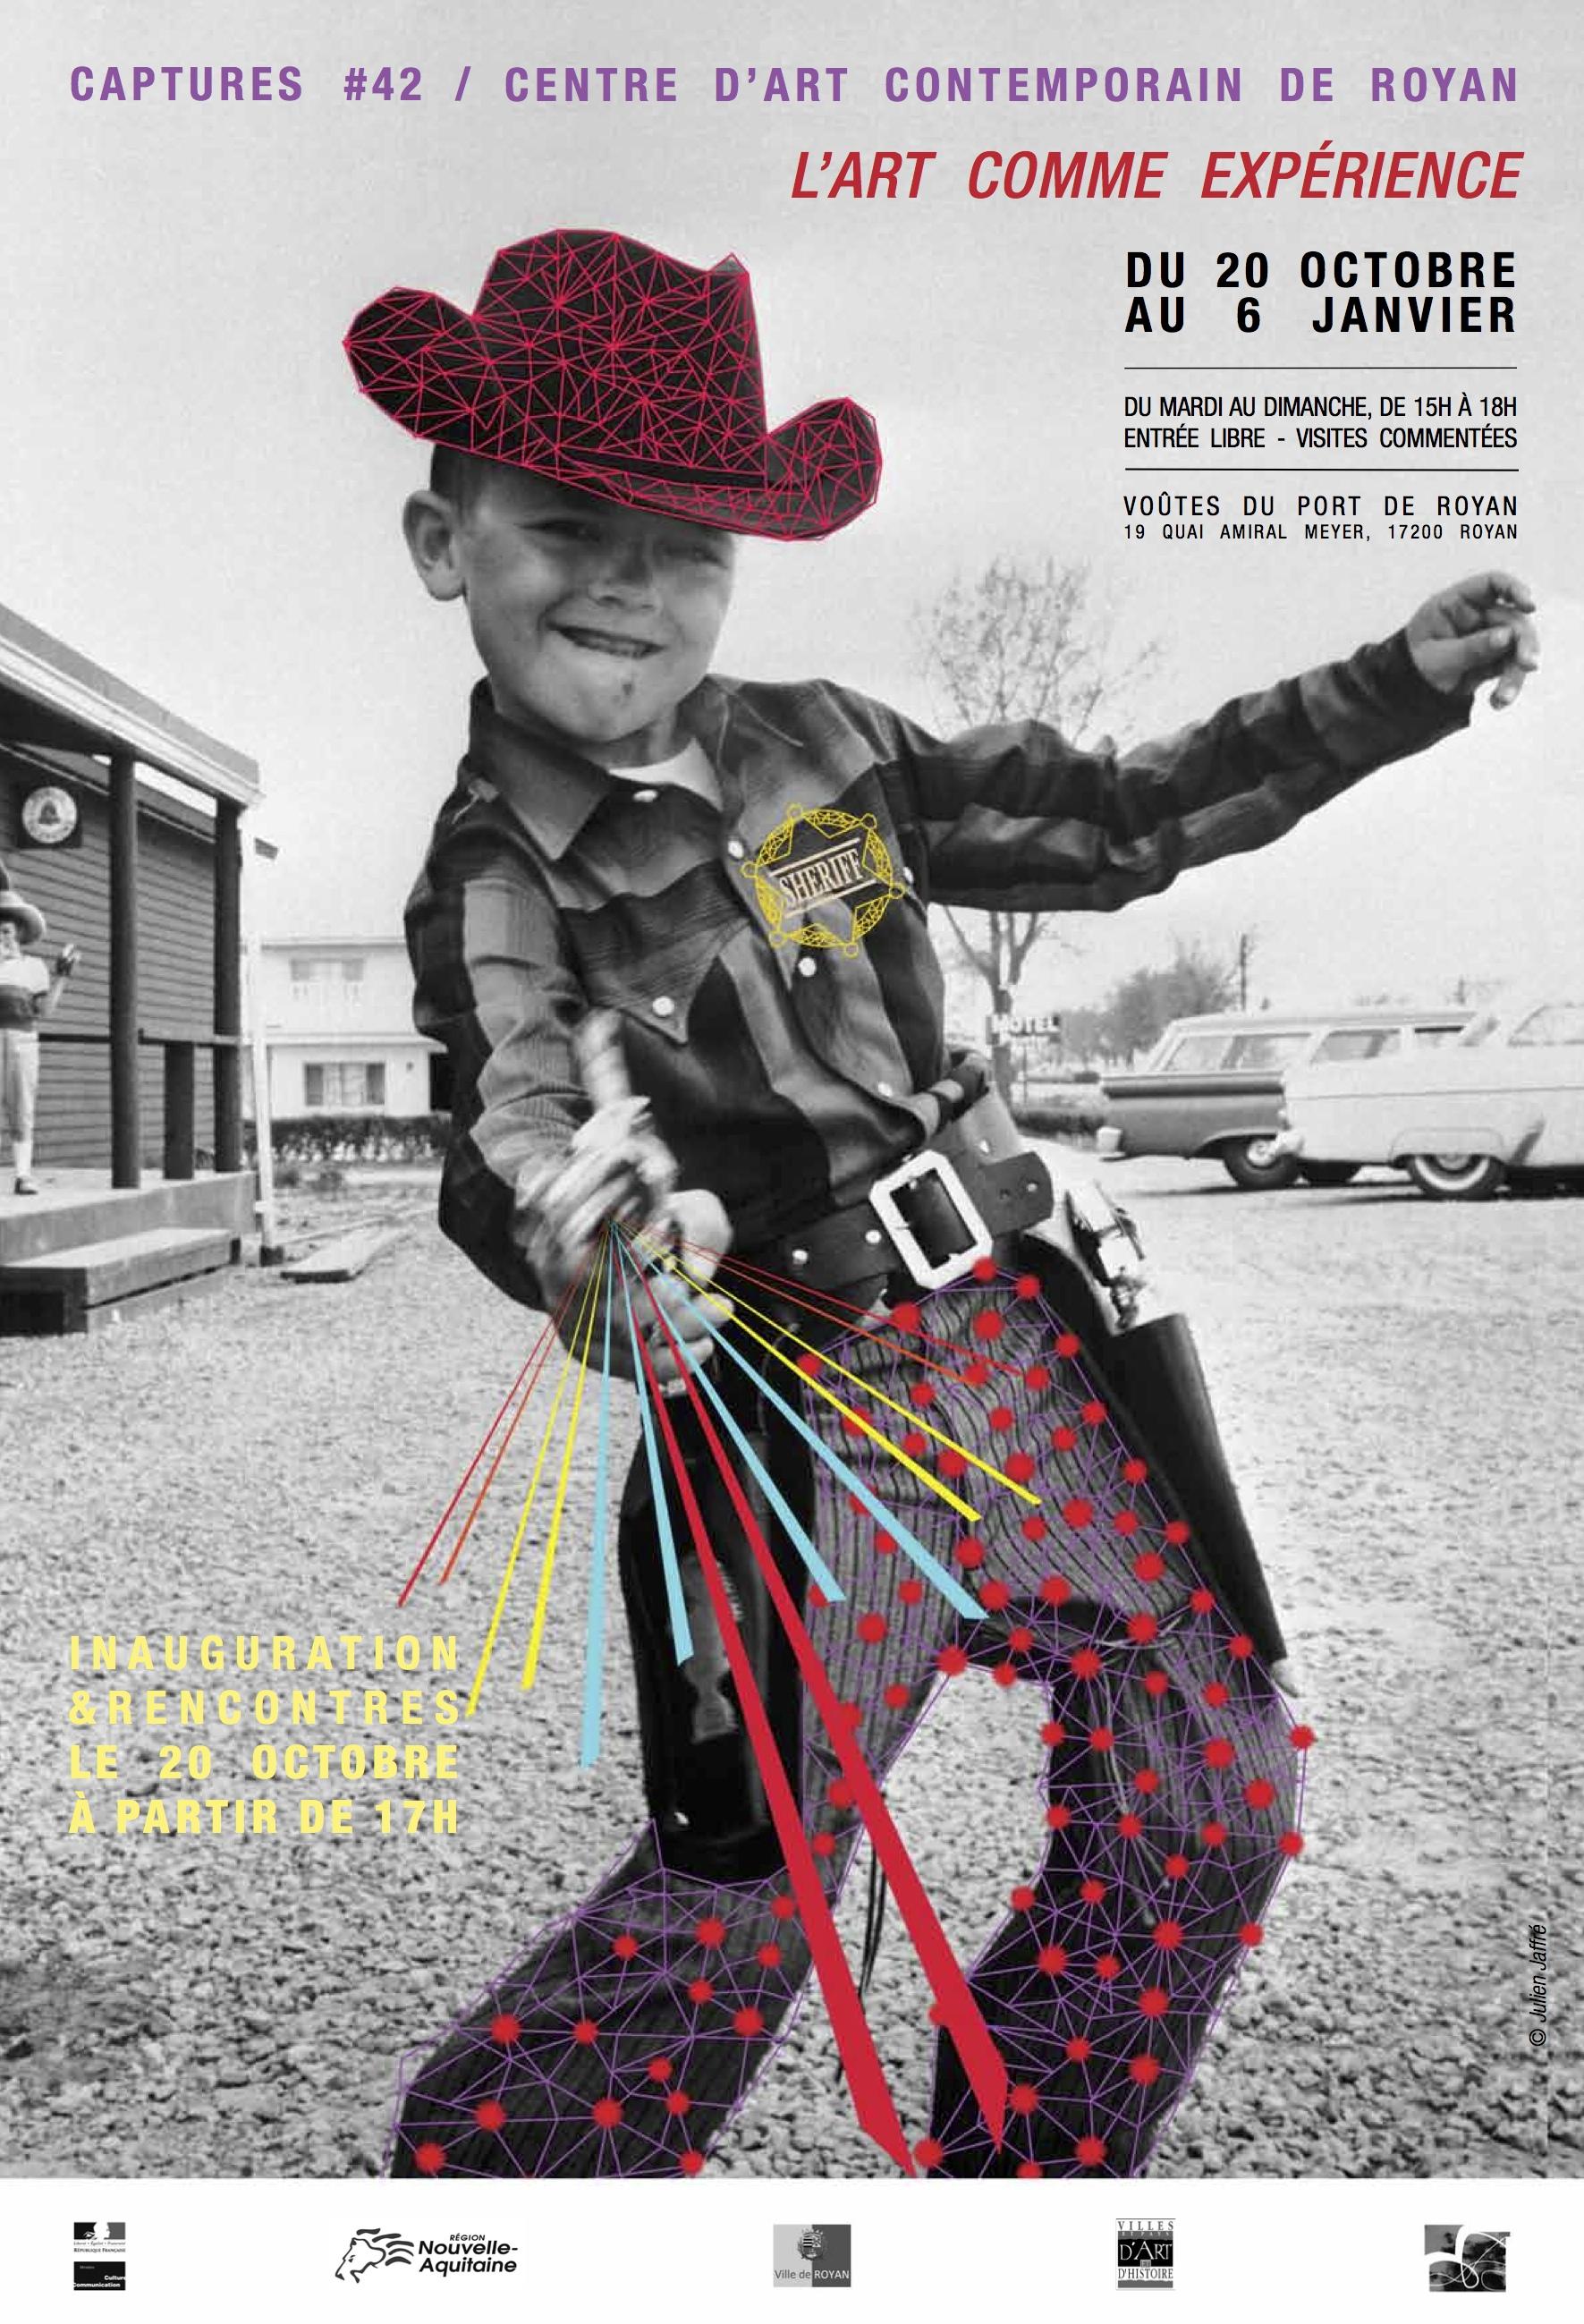 presse-captures-42-120x176-cowboy